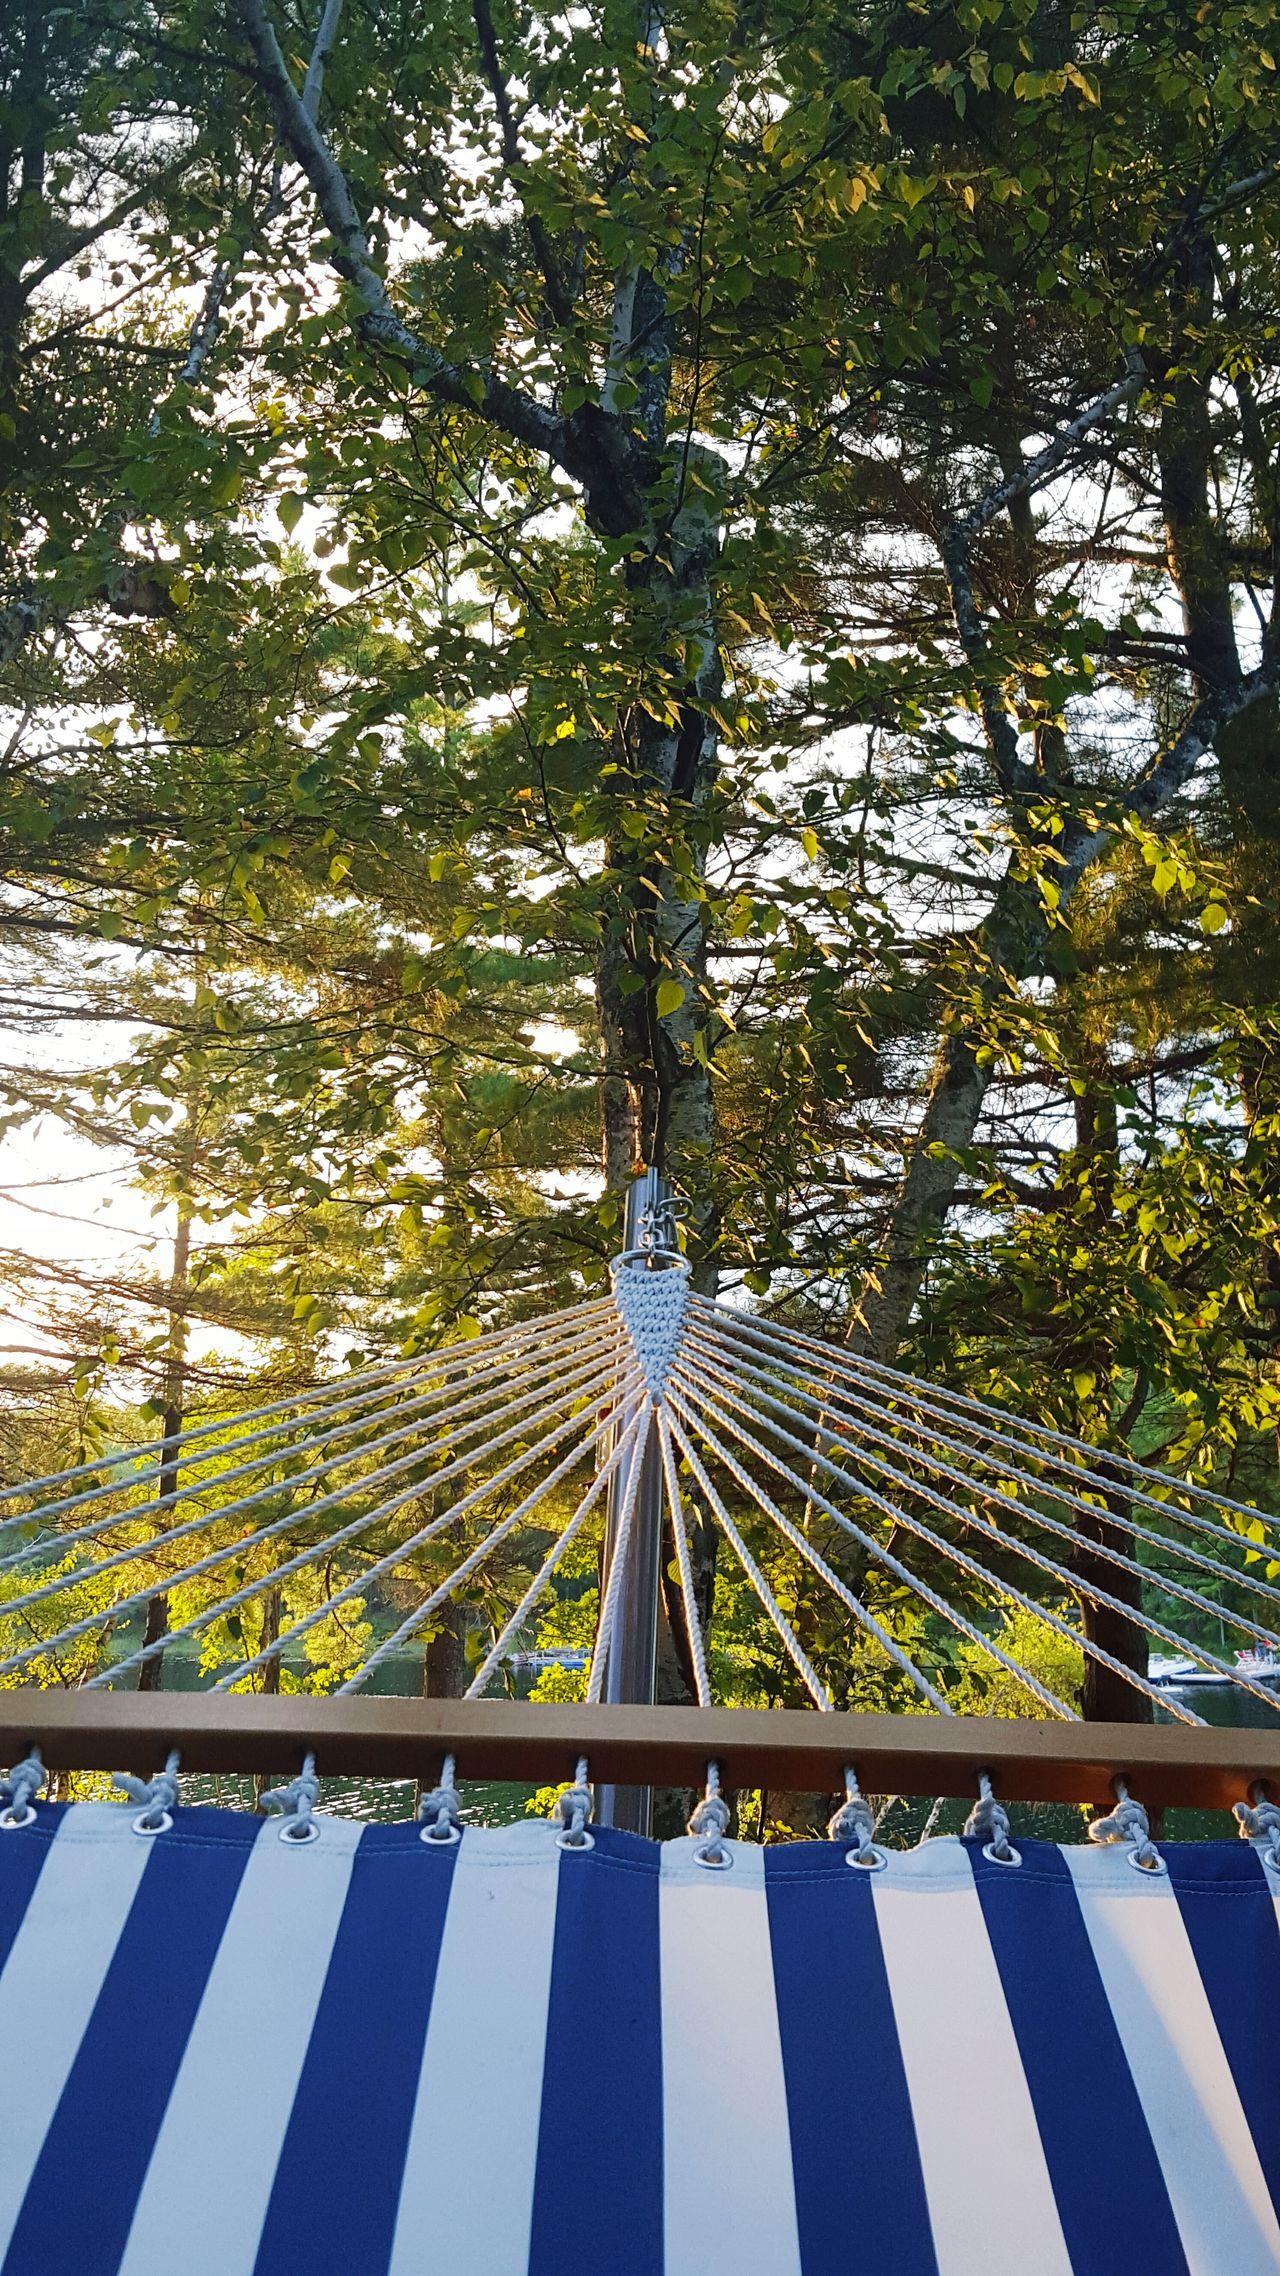 Hammocklife Hammockcamping Sky And Trees On The Hammock Mainelife Mainephotography Maine The Way Life Should Be Hammocking In My Hammock My Afternoon Hammock